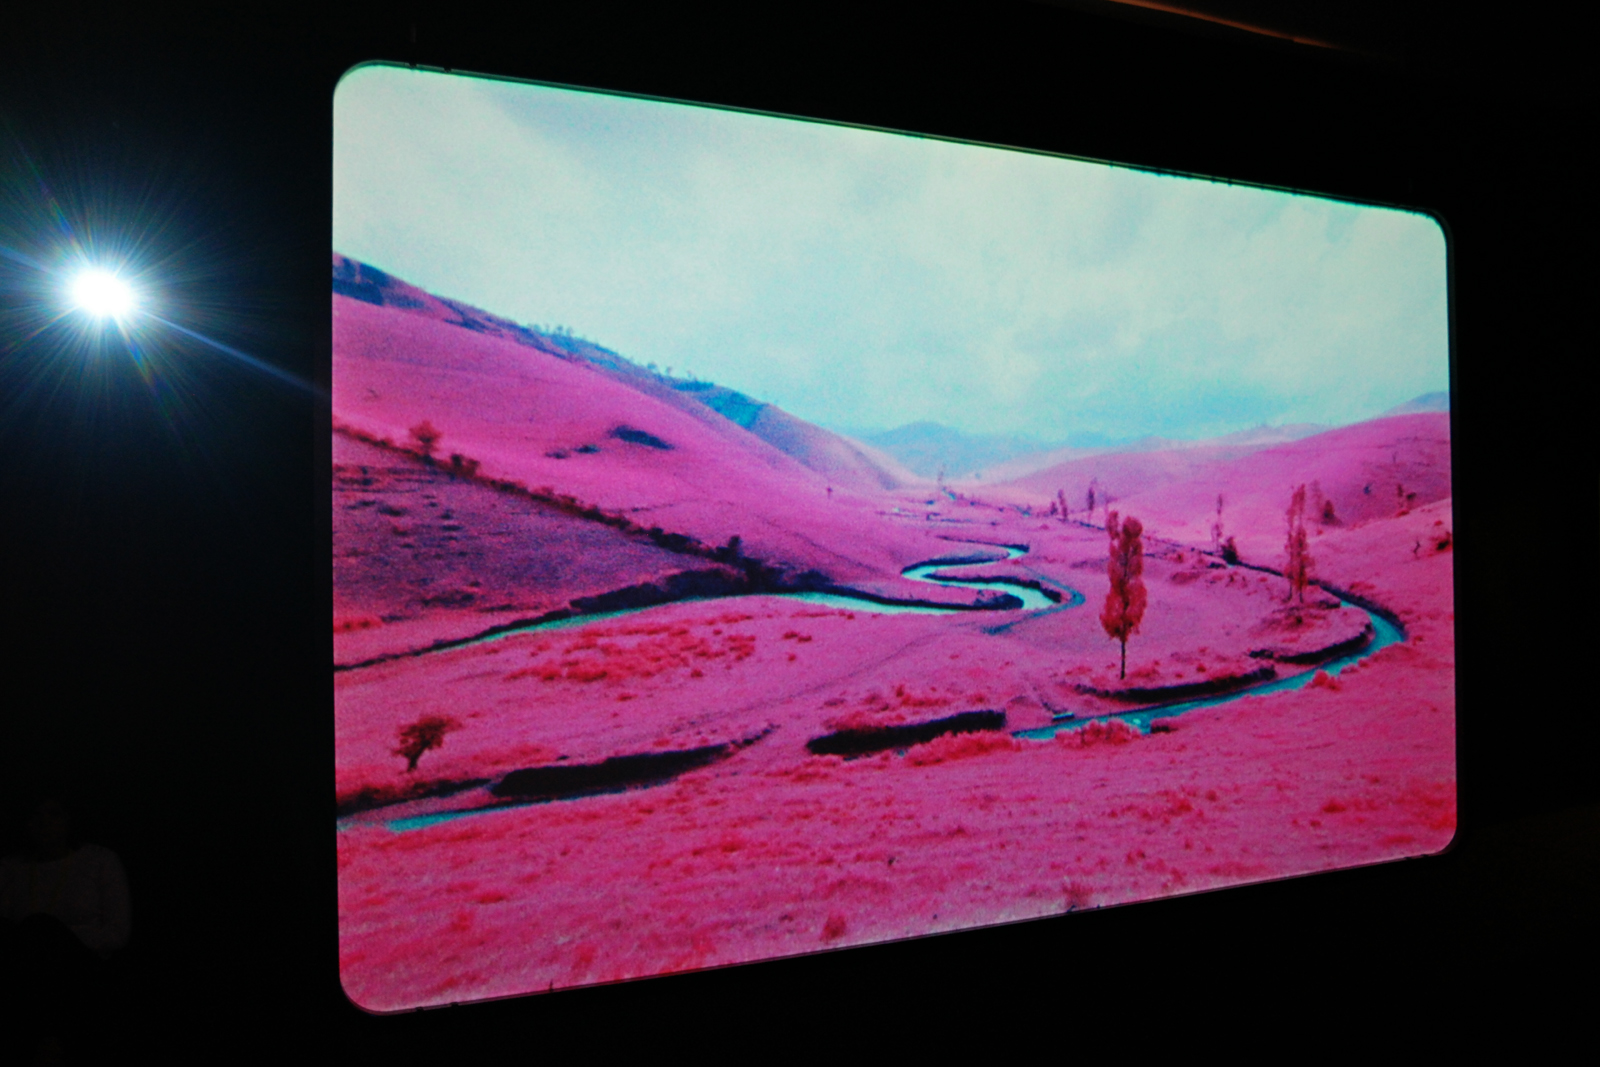 Landscape The Enclave 2012-2015 by Richard Mosse Jack Shainman Gallery exhibition expo Tu dois changer ta vie Tripostal Lille 3000 Renaissance curator Fabrice Bousteau